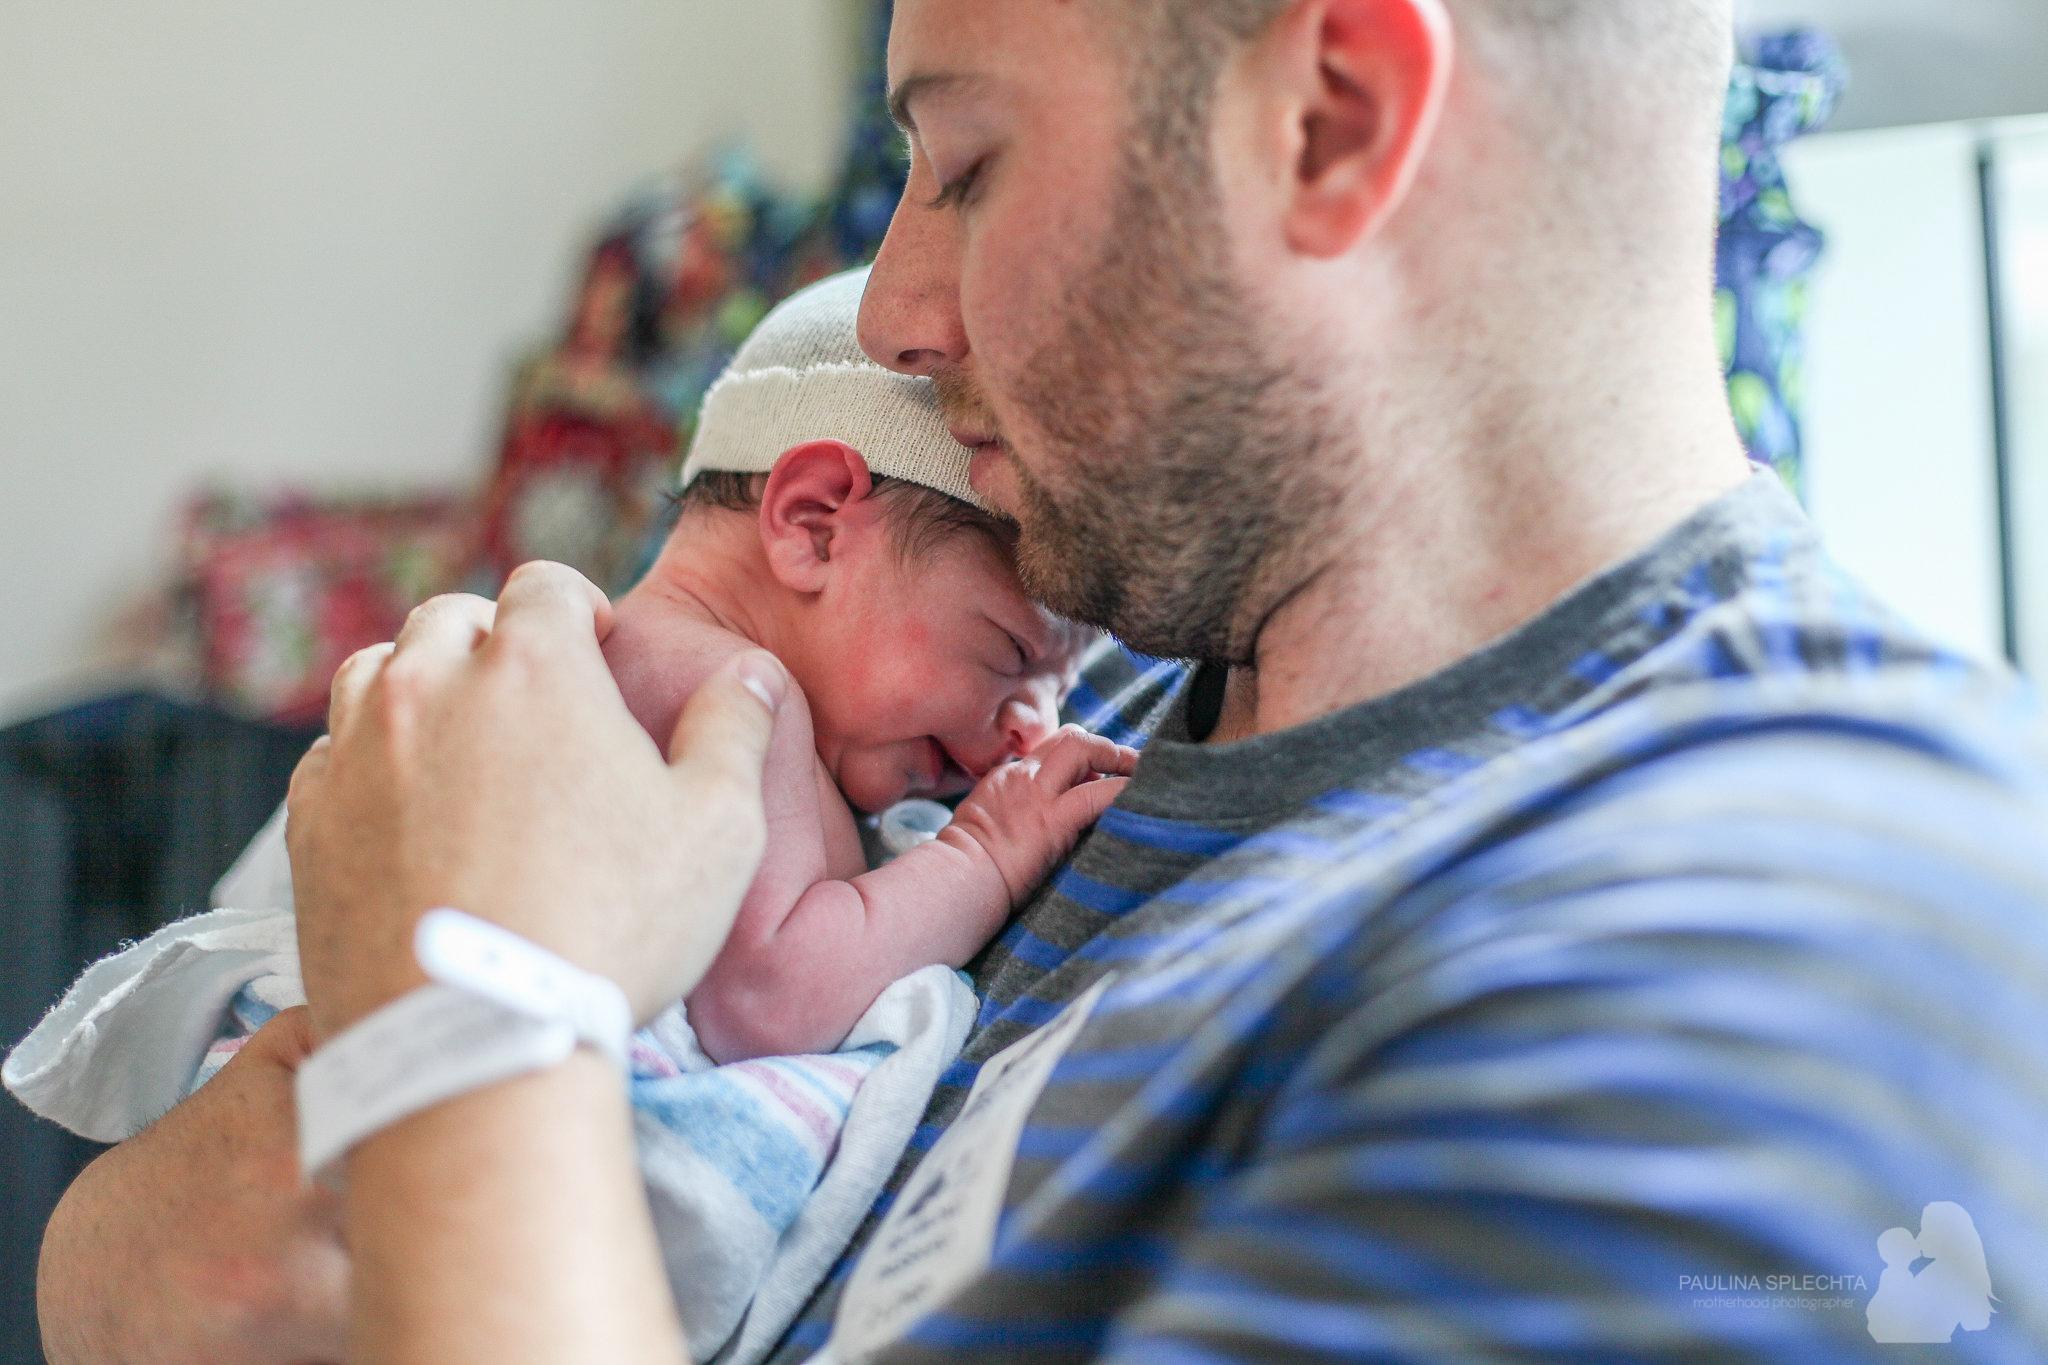 birth-center-hospital-photographer-photography-breastfeeding-south-florida-boca-regional-delray-palms-hollywood-pumping-water-natural-family-newborn-34.jpg